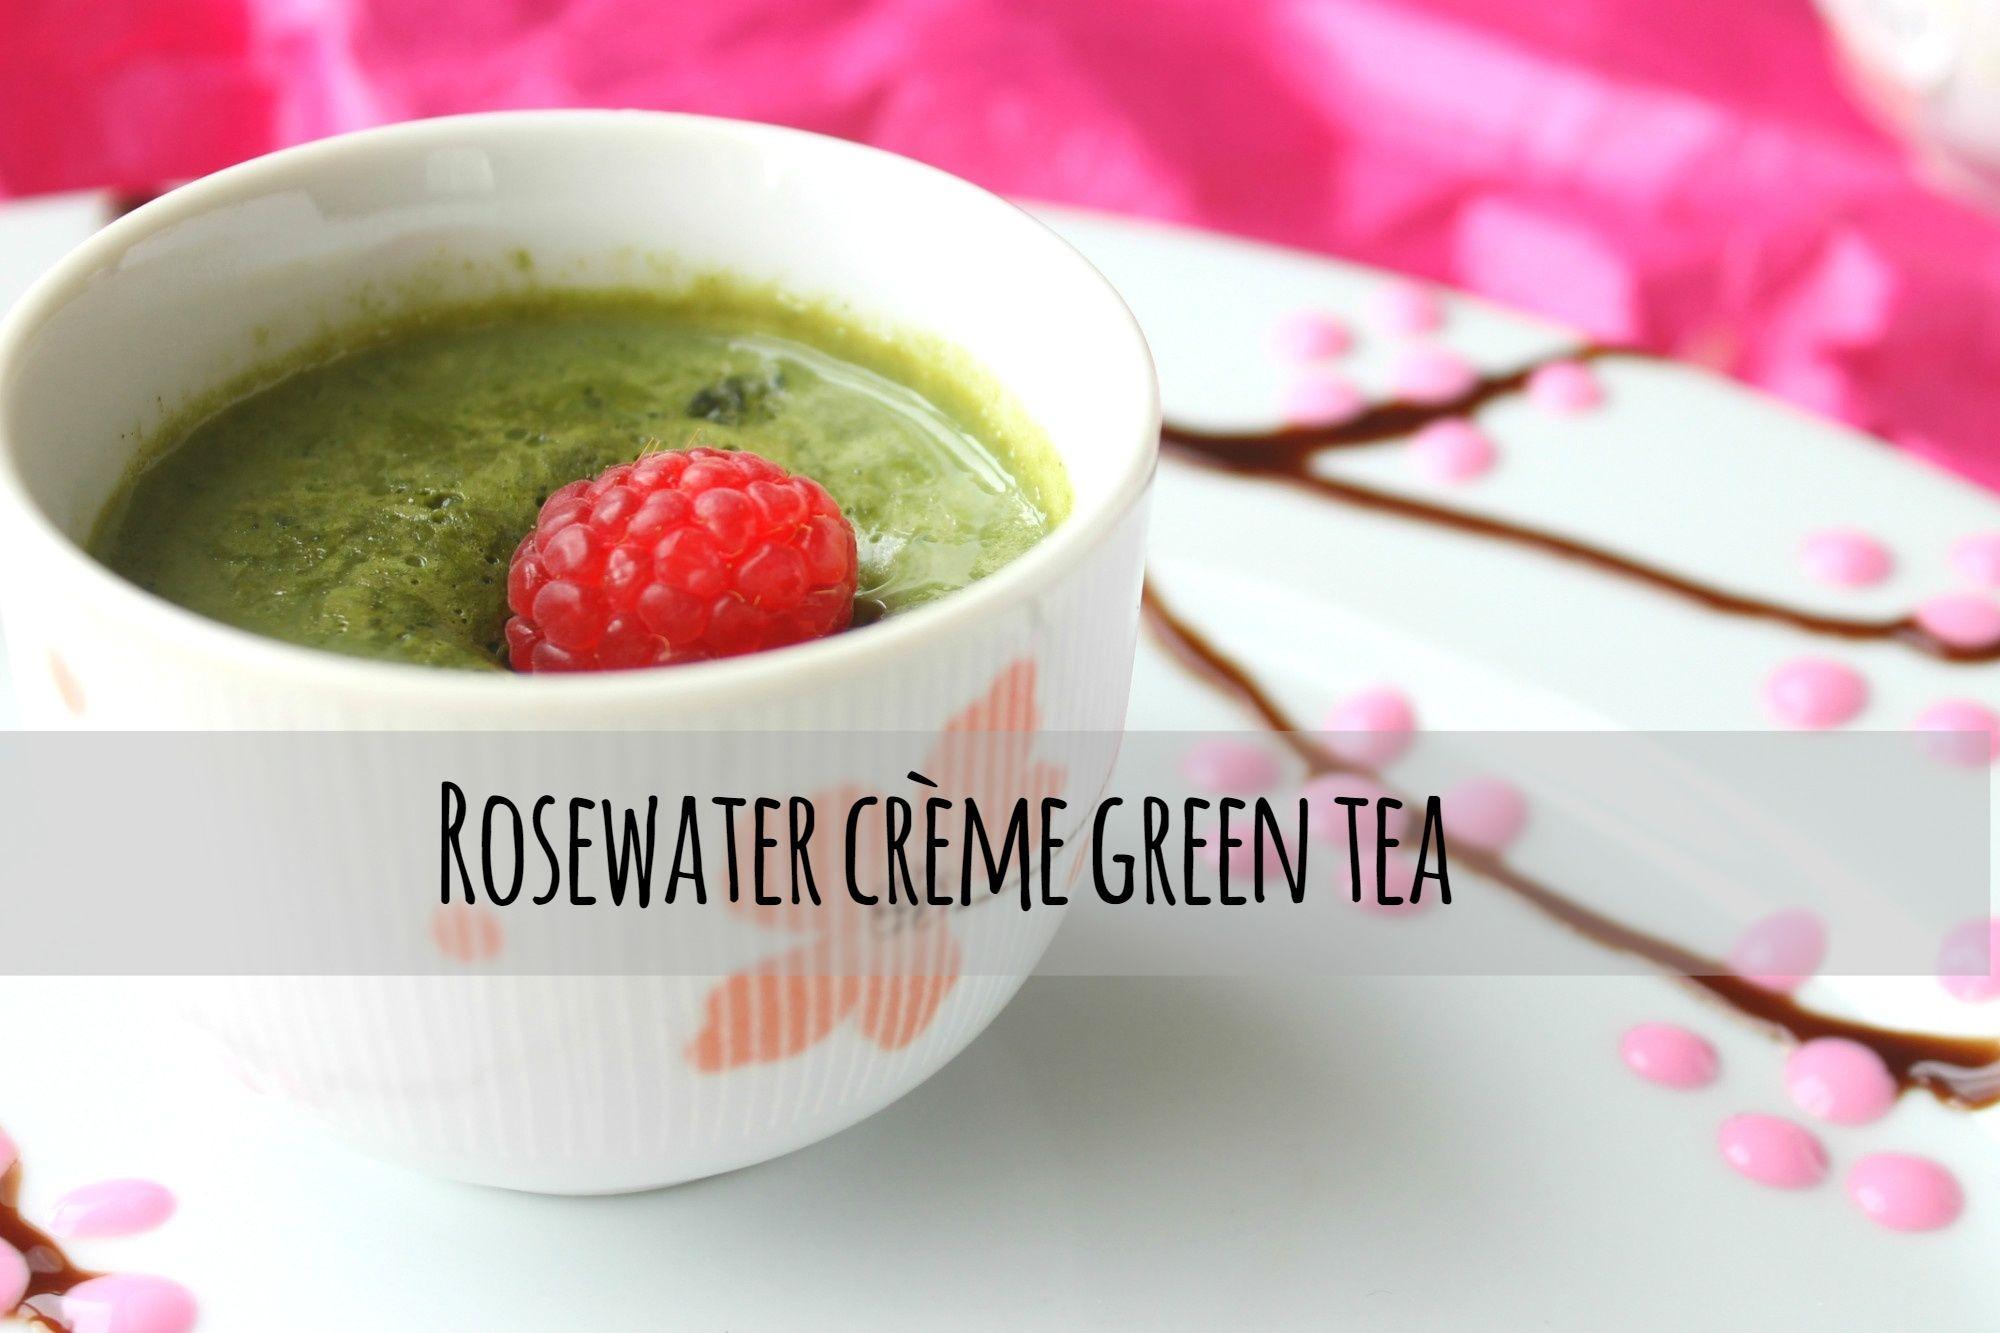 Rosewater crème green tea